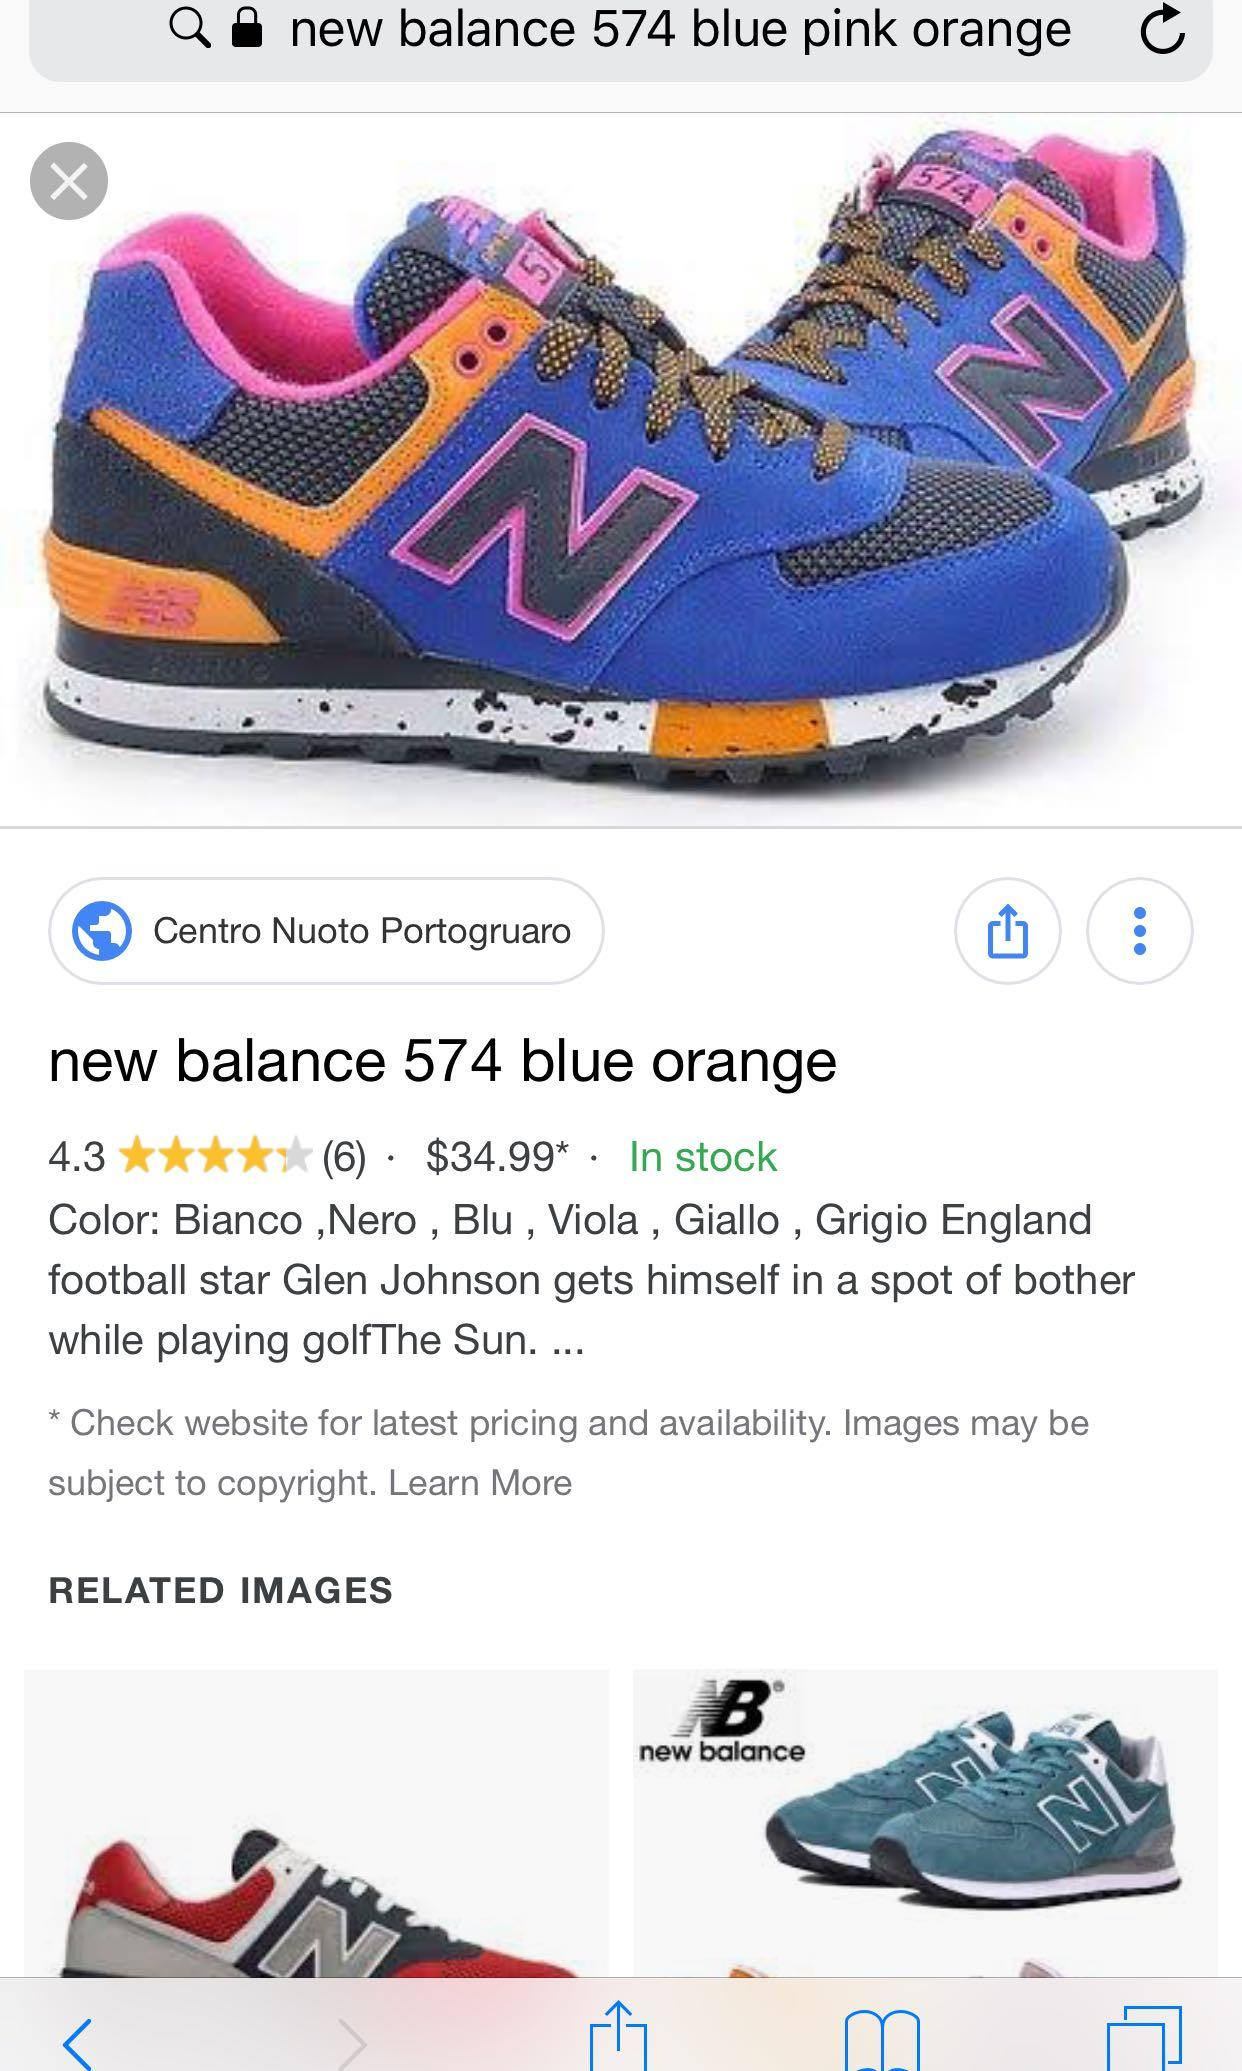 NEW BALANCE 574 blue orange